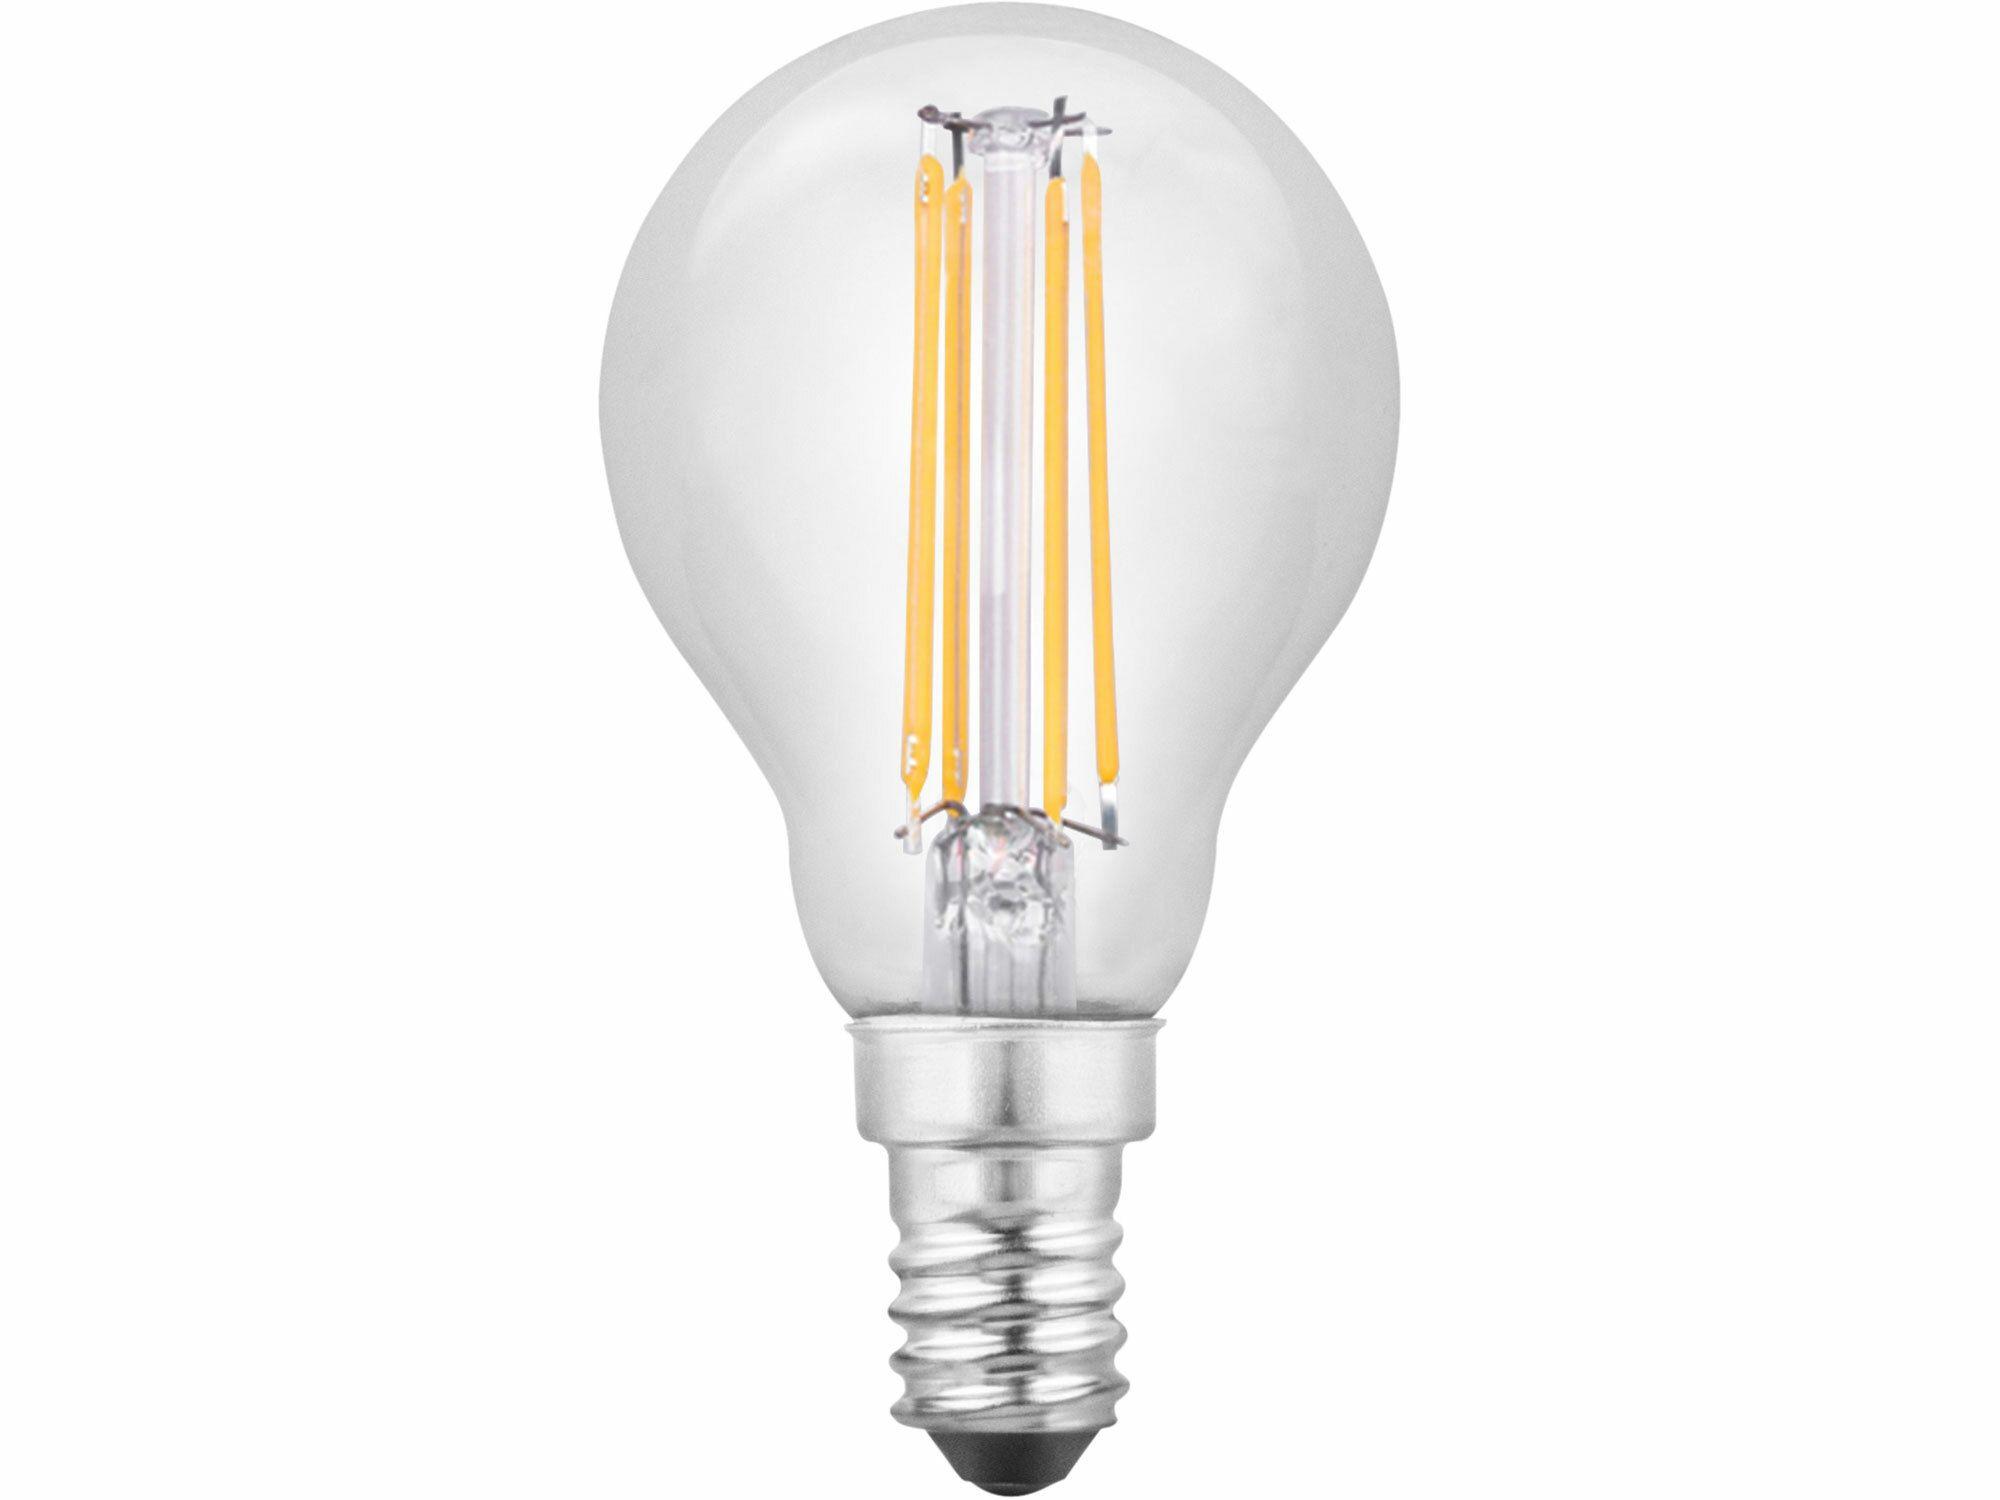 Žárovka LED 360°, 400lm, 4W, E14, teplá bílá, EXTOL LIGHT